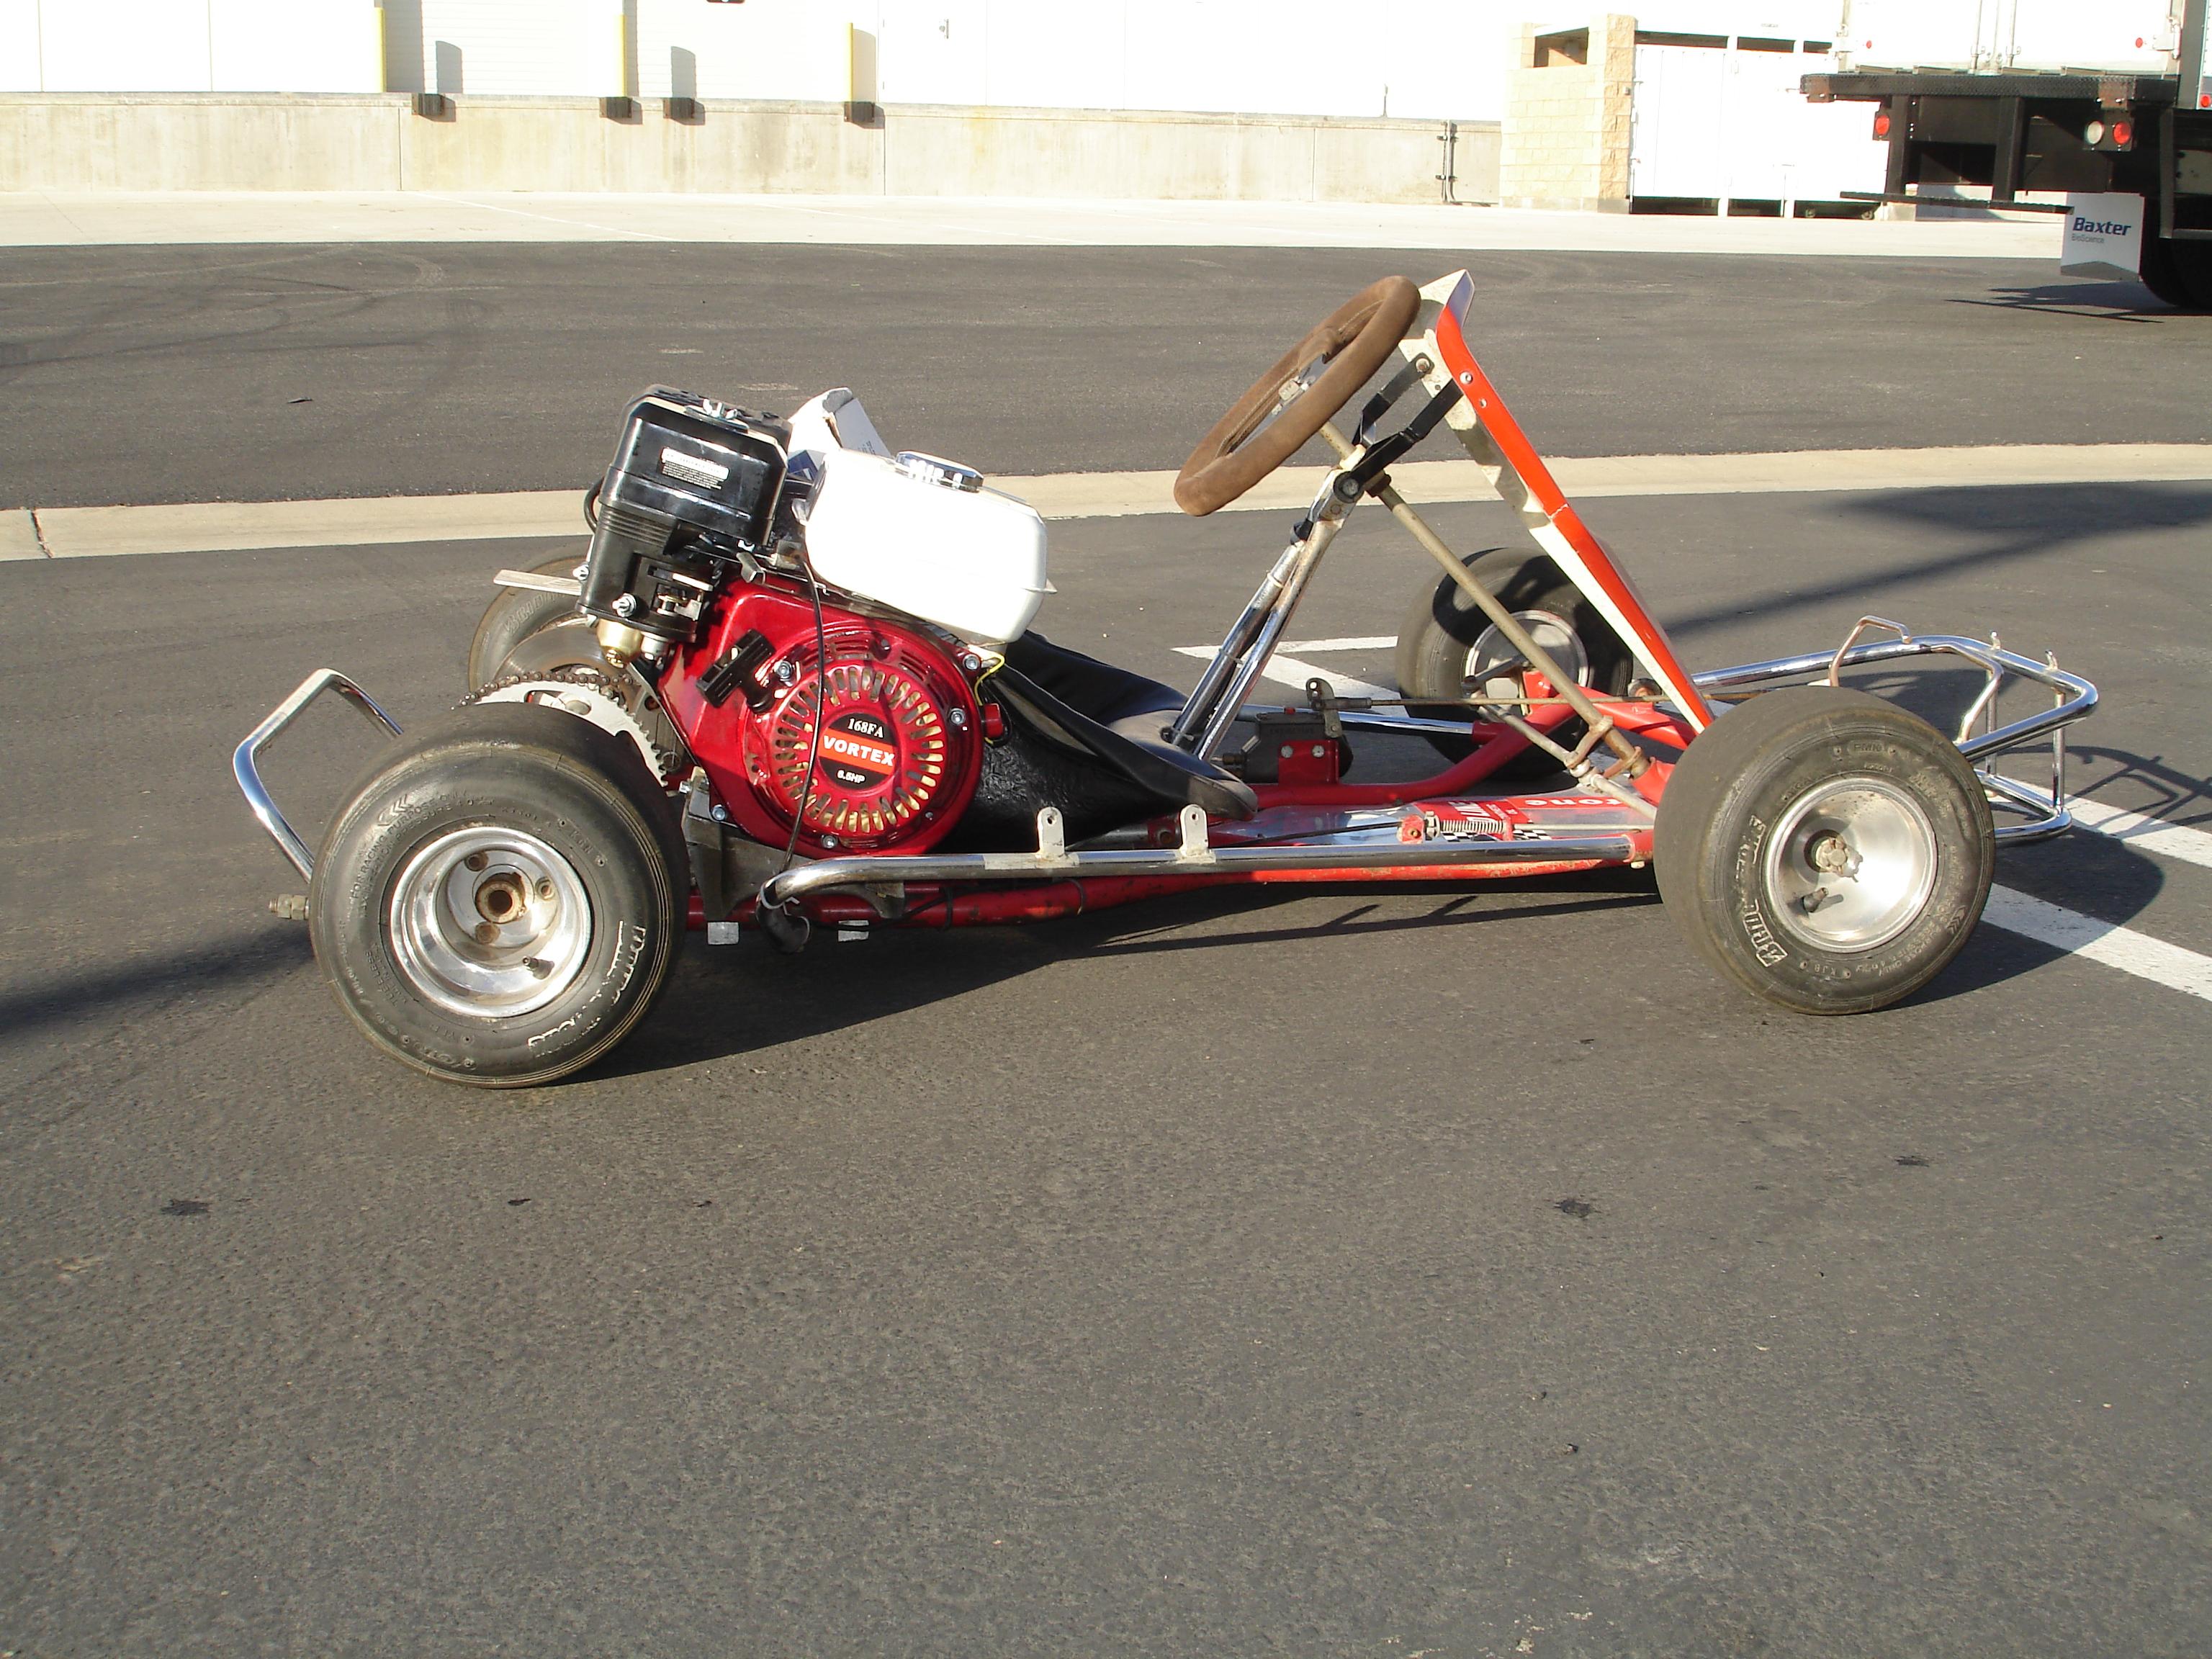 Gokart business plan - Go Kart Business Plan | Go Kart